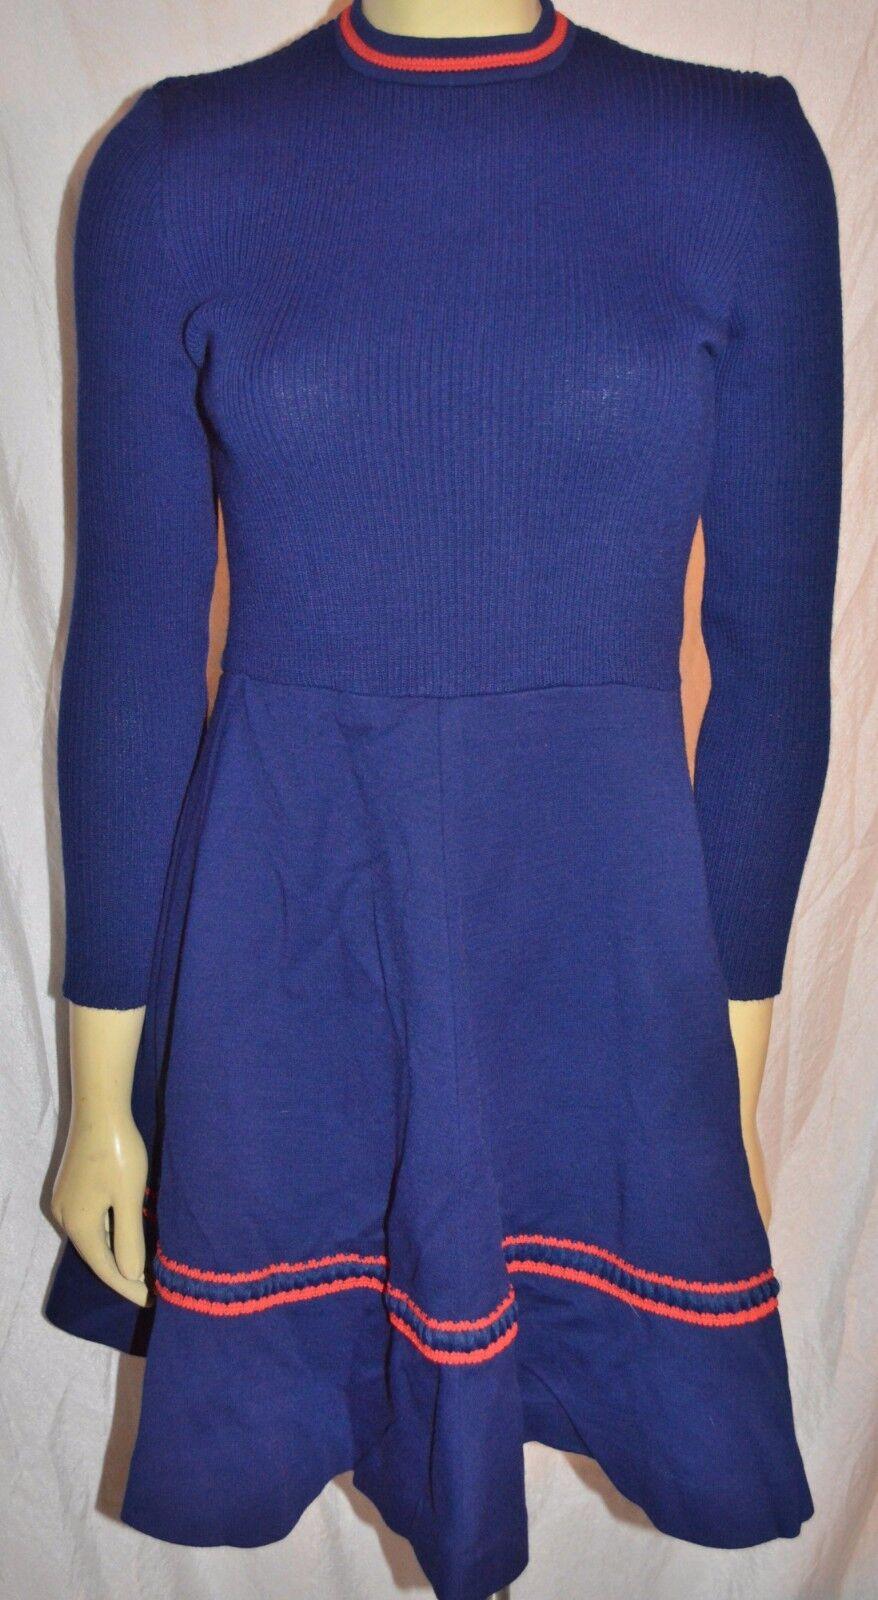 Vintage 1960s 60s bluee Fit Flare Dress Knit Mod Hipster CRAZY GREAT size S